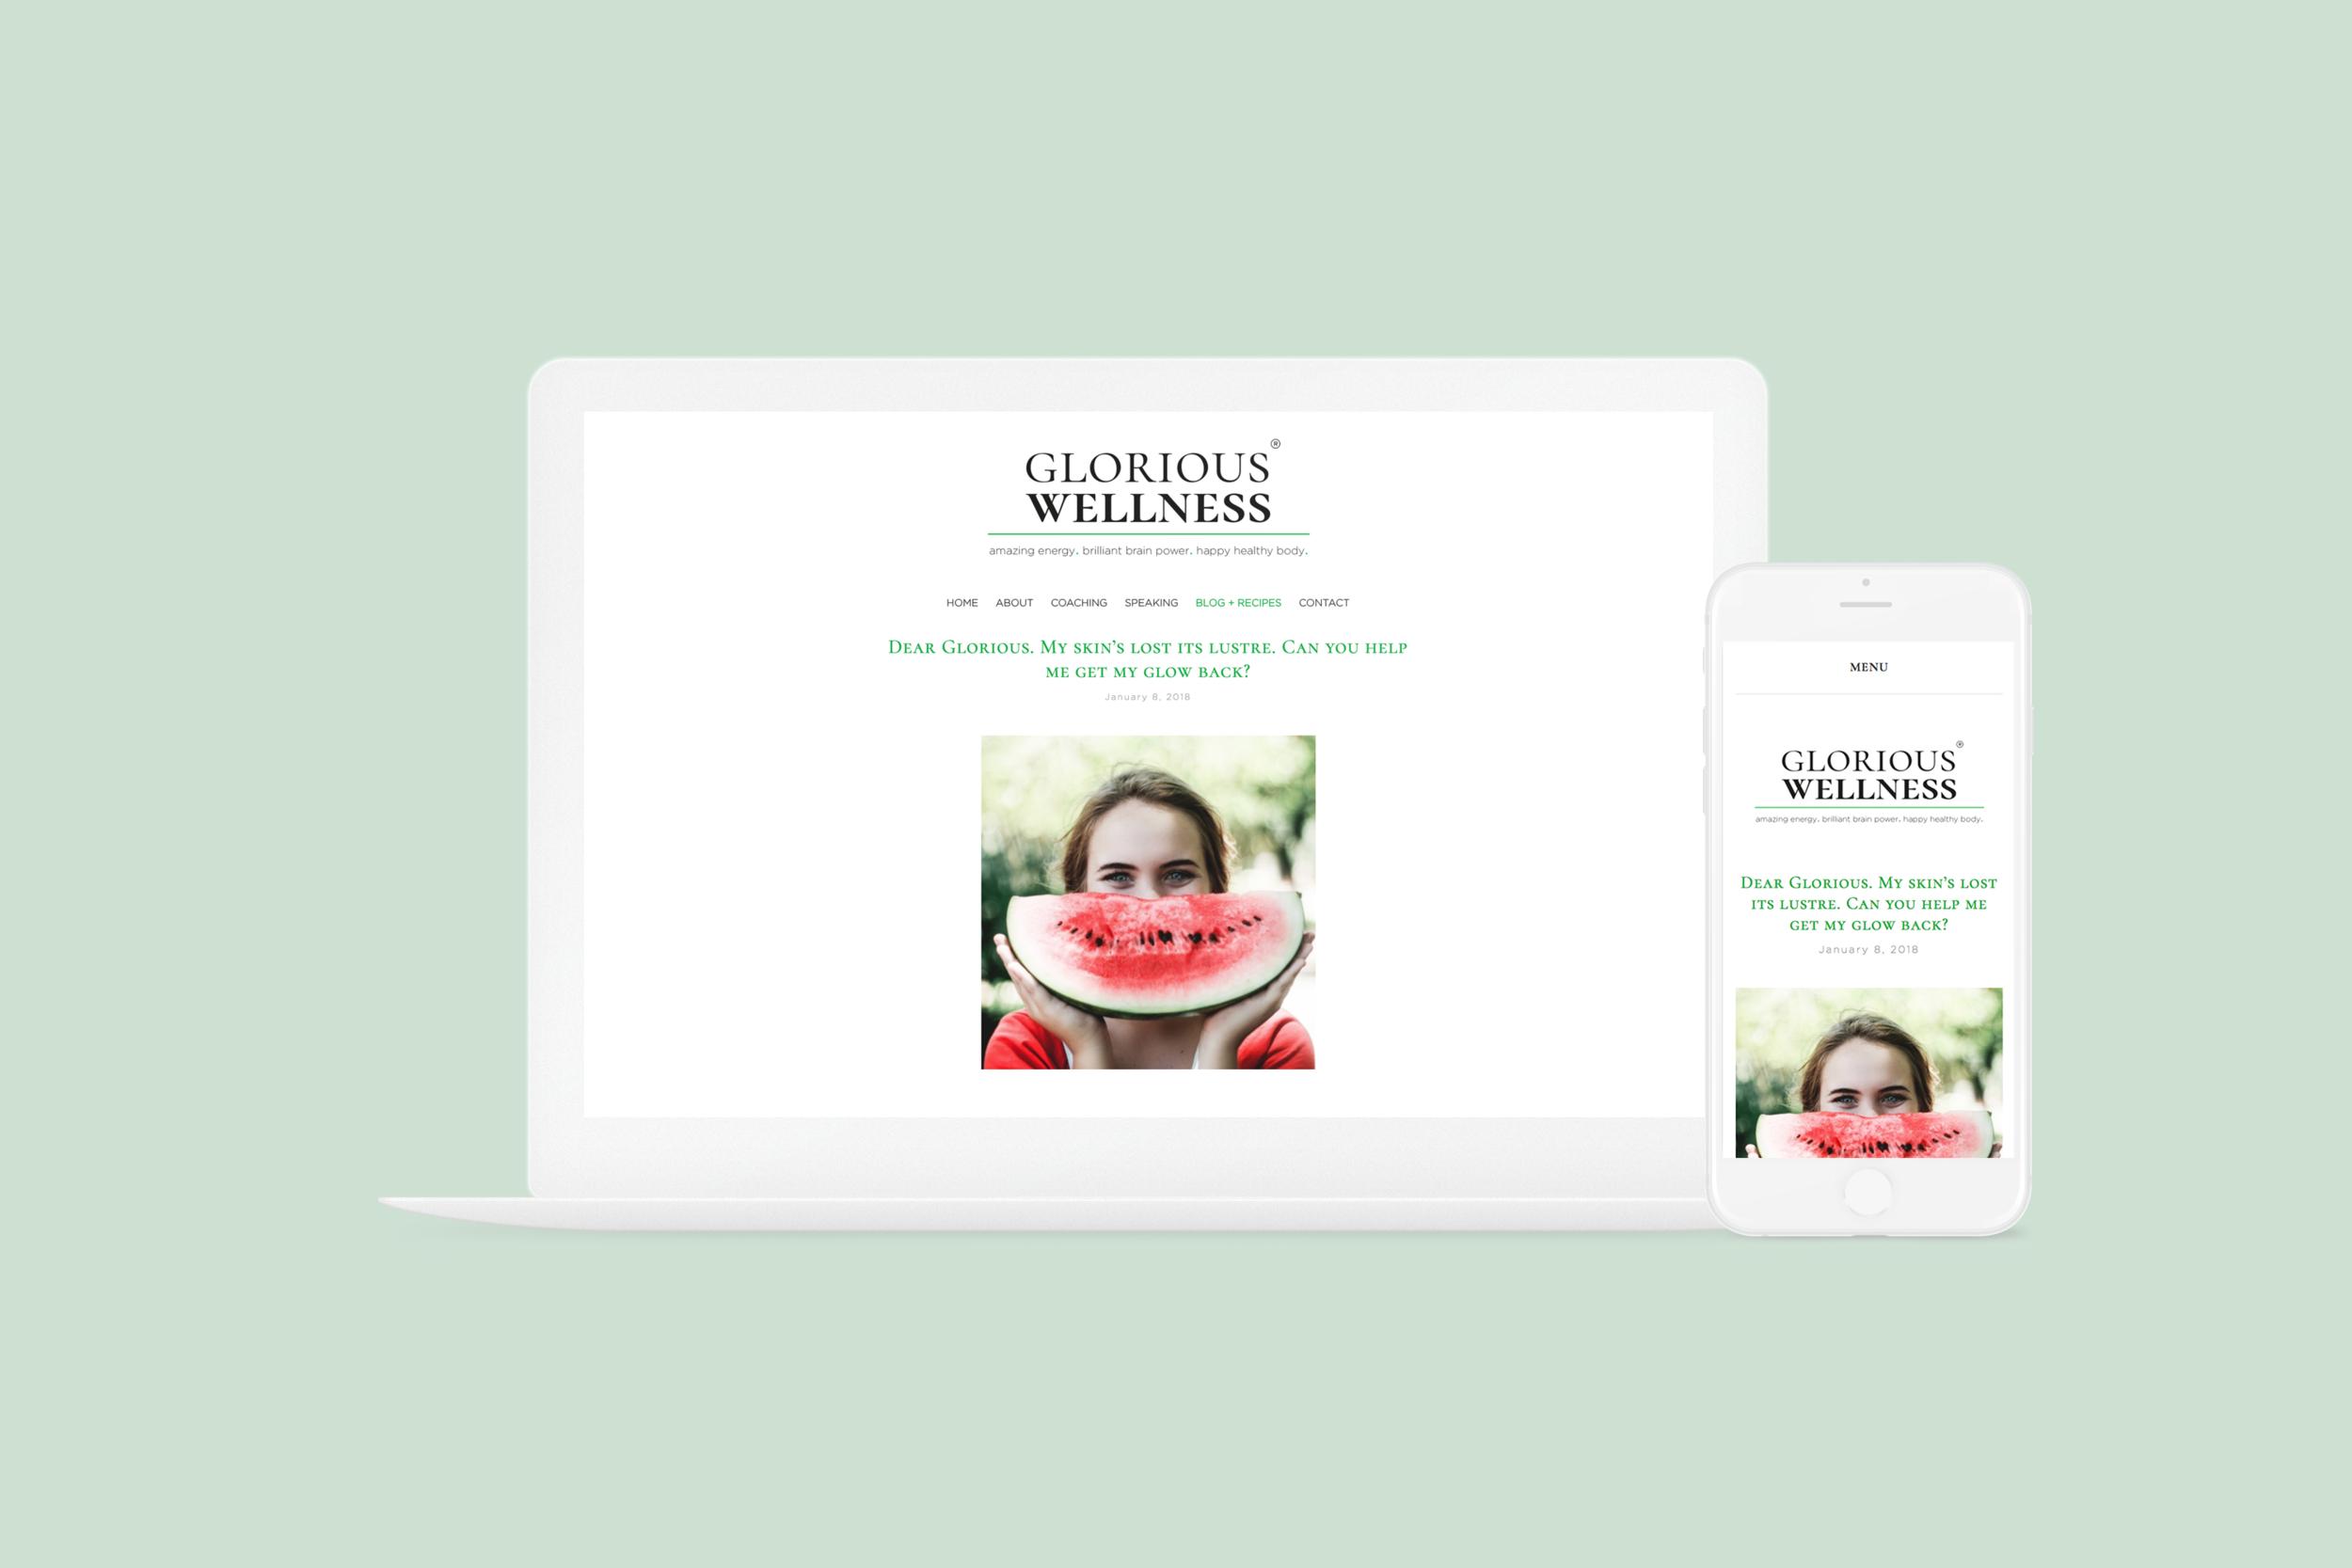 bgsd-branding-web-design-glorious-wellness-blog responsive website.png